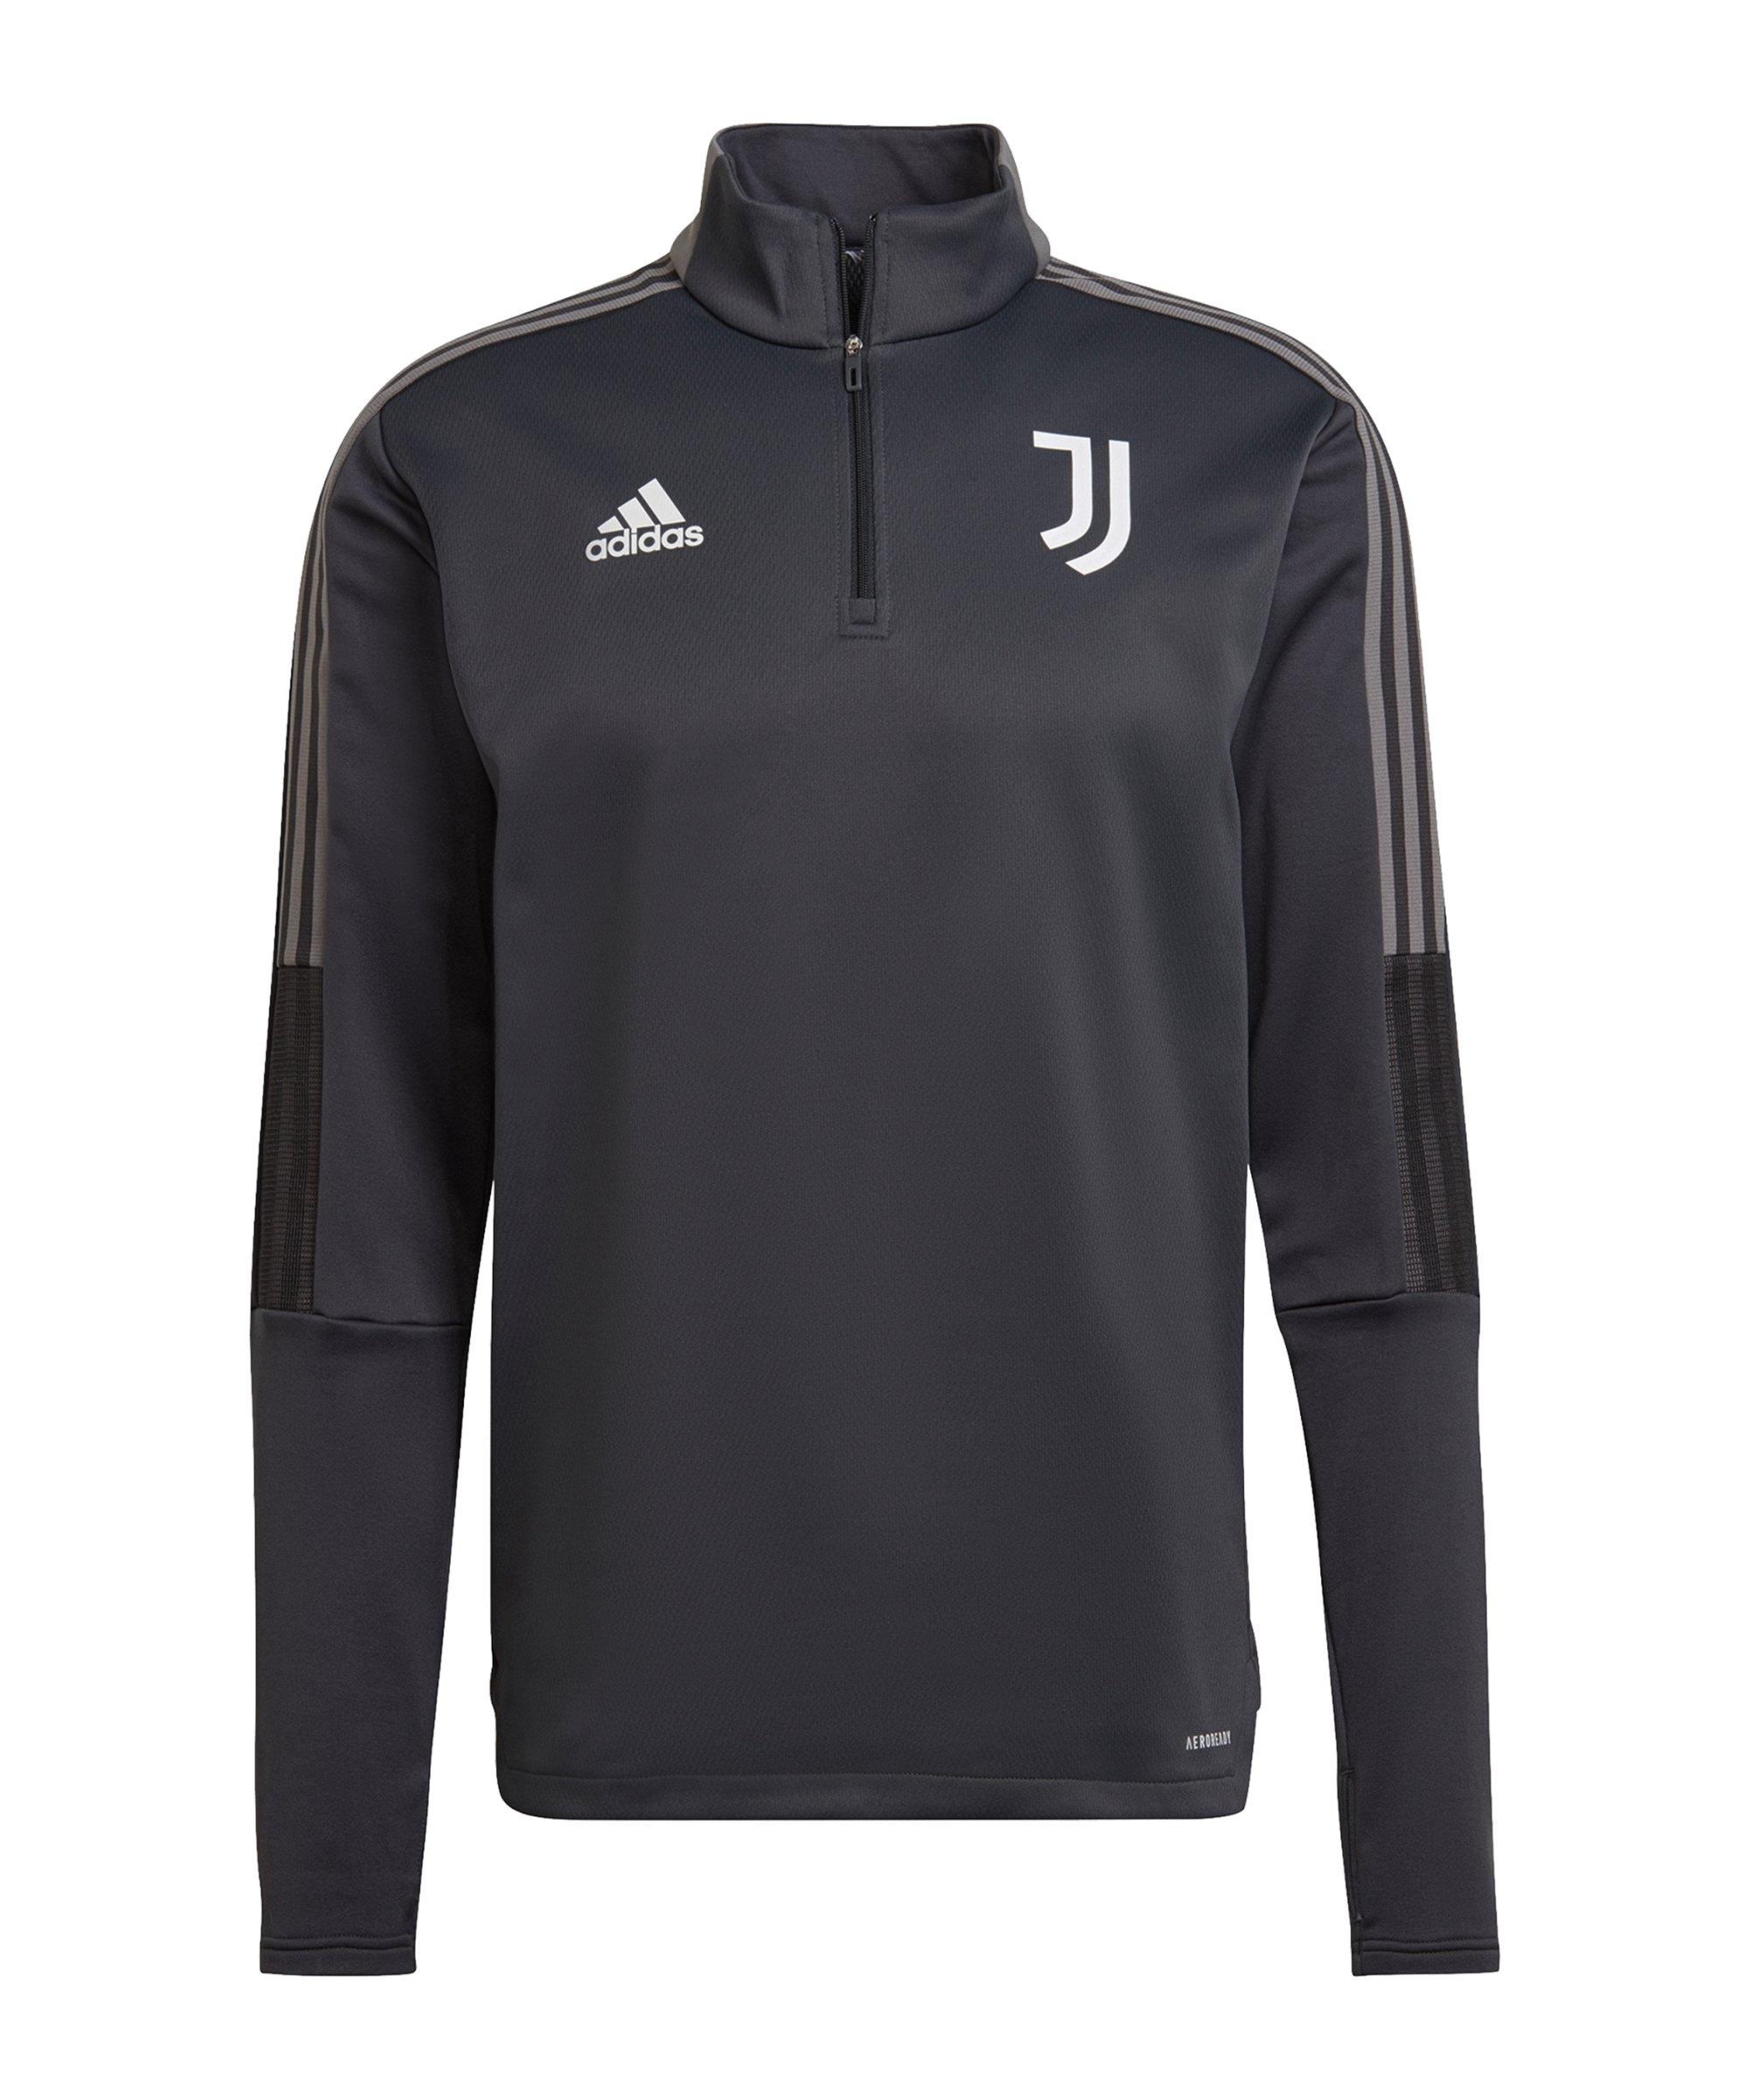 adidas Juventus Turin Warmtop Grau - grau